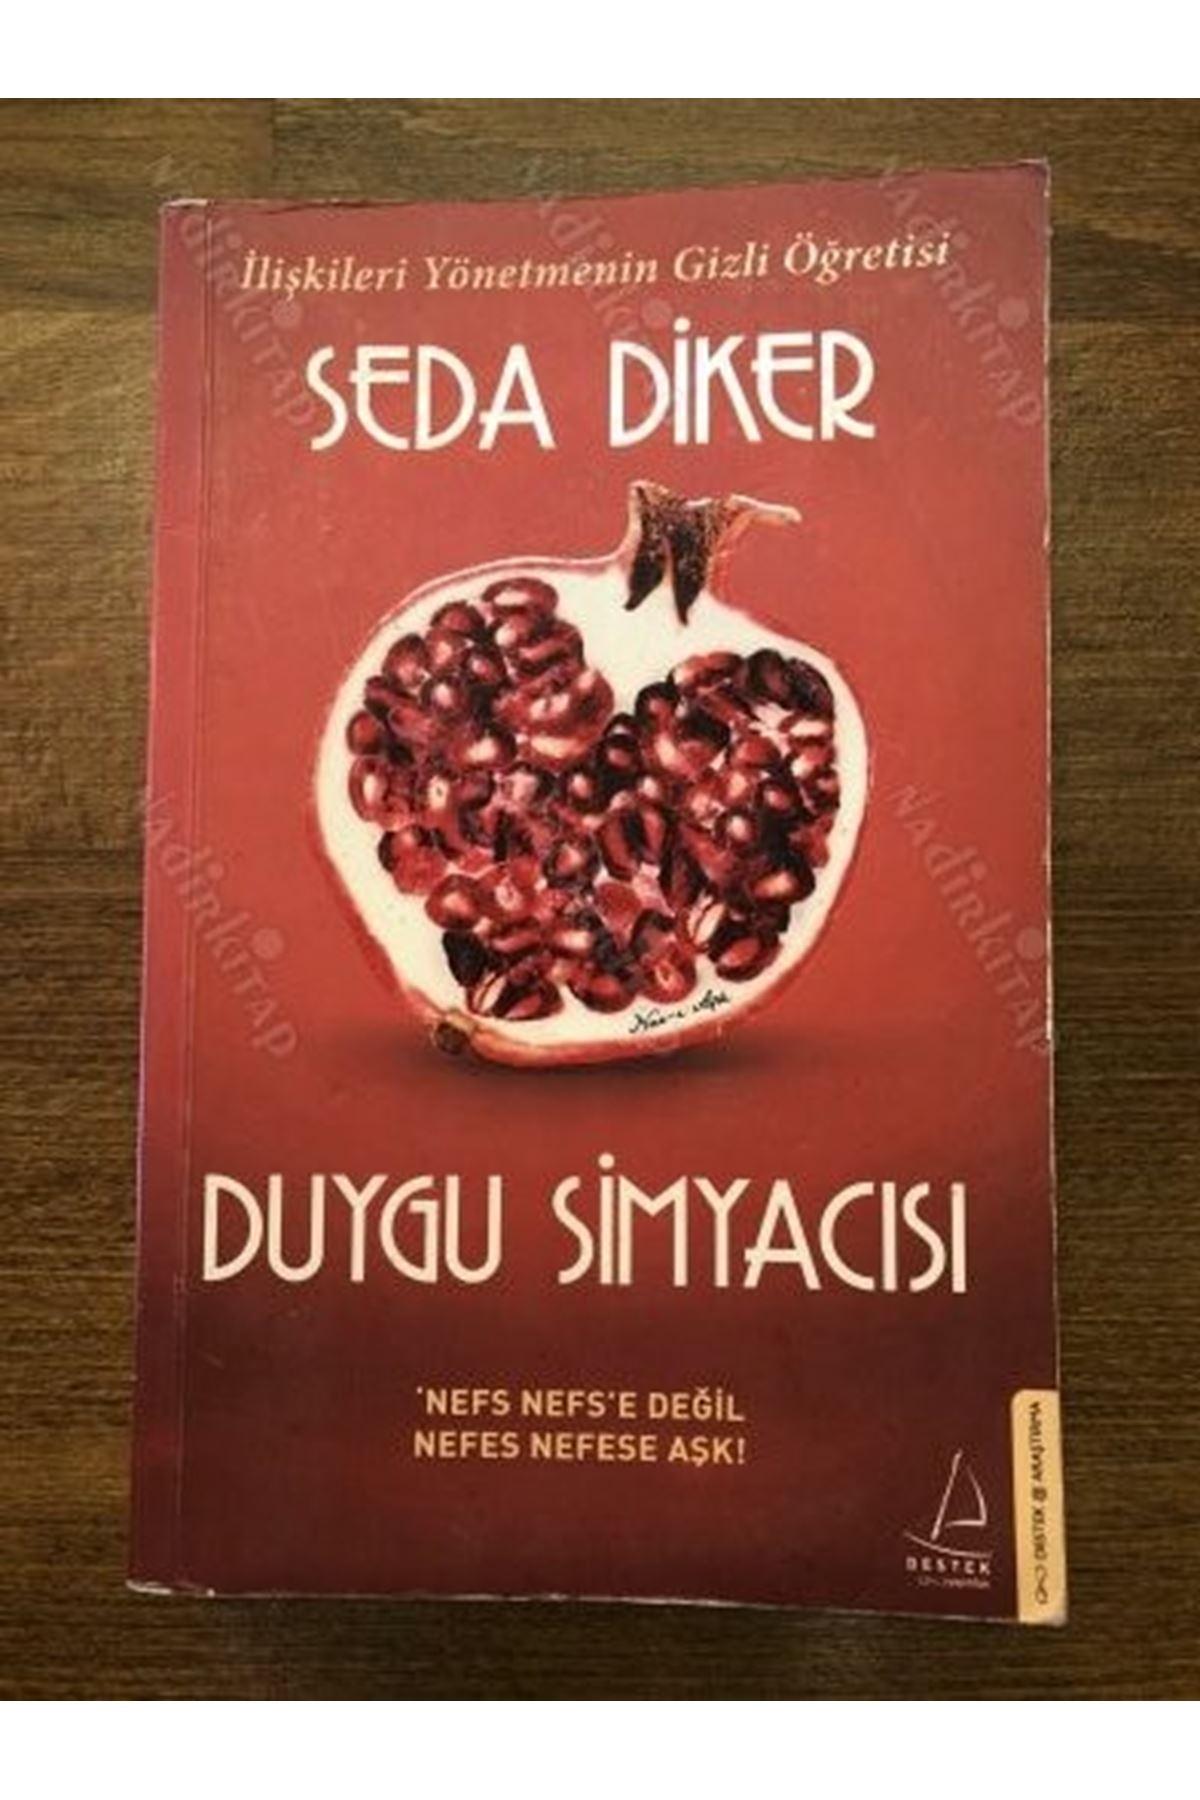 SEDA DİKER - DUYGU SİMYACISI